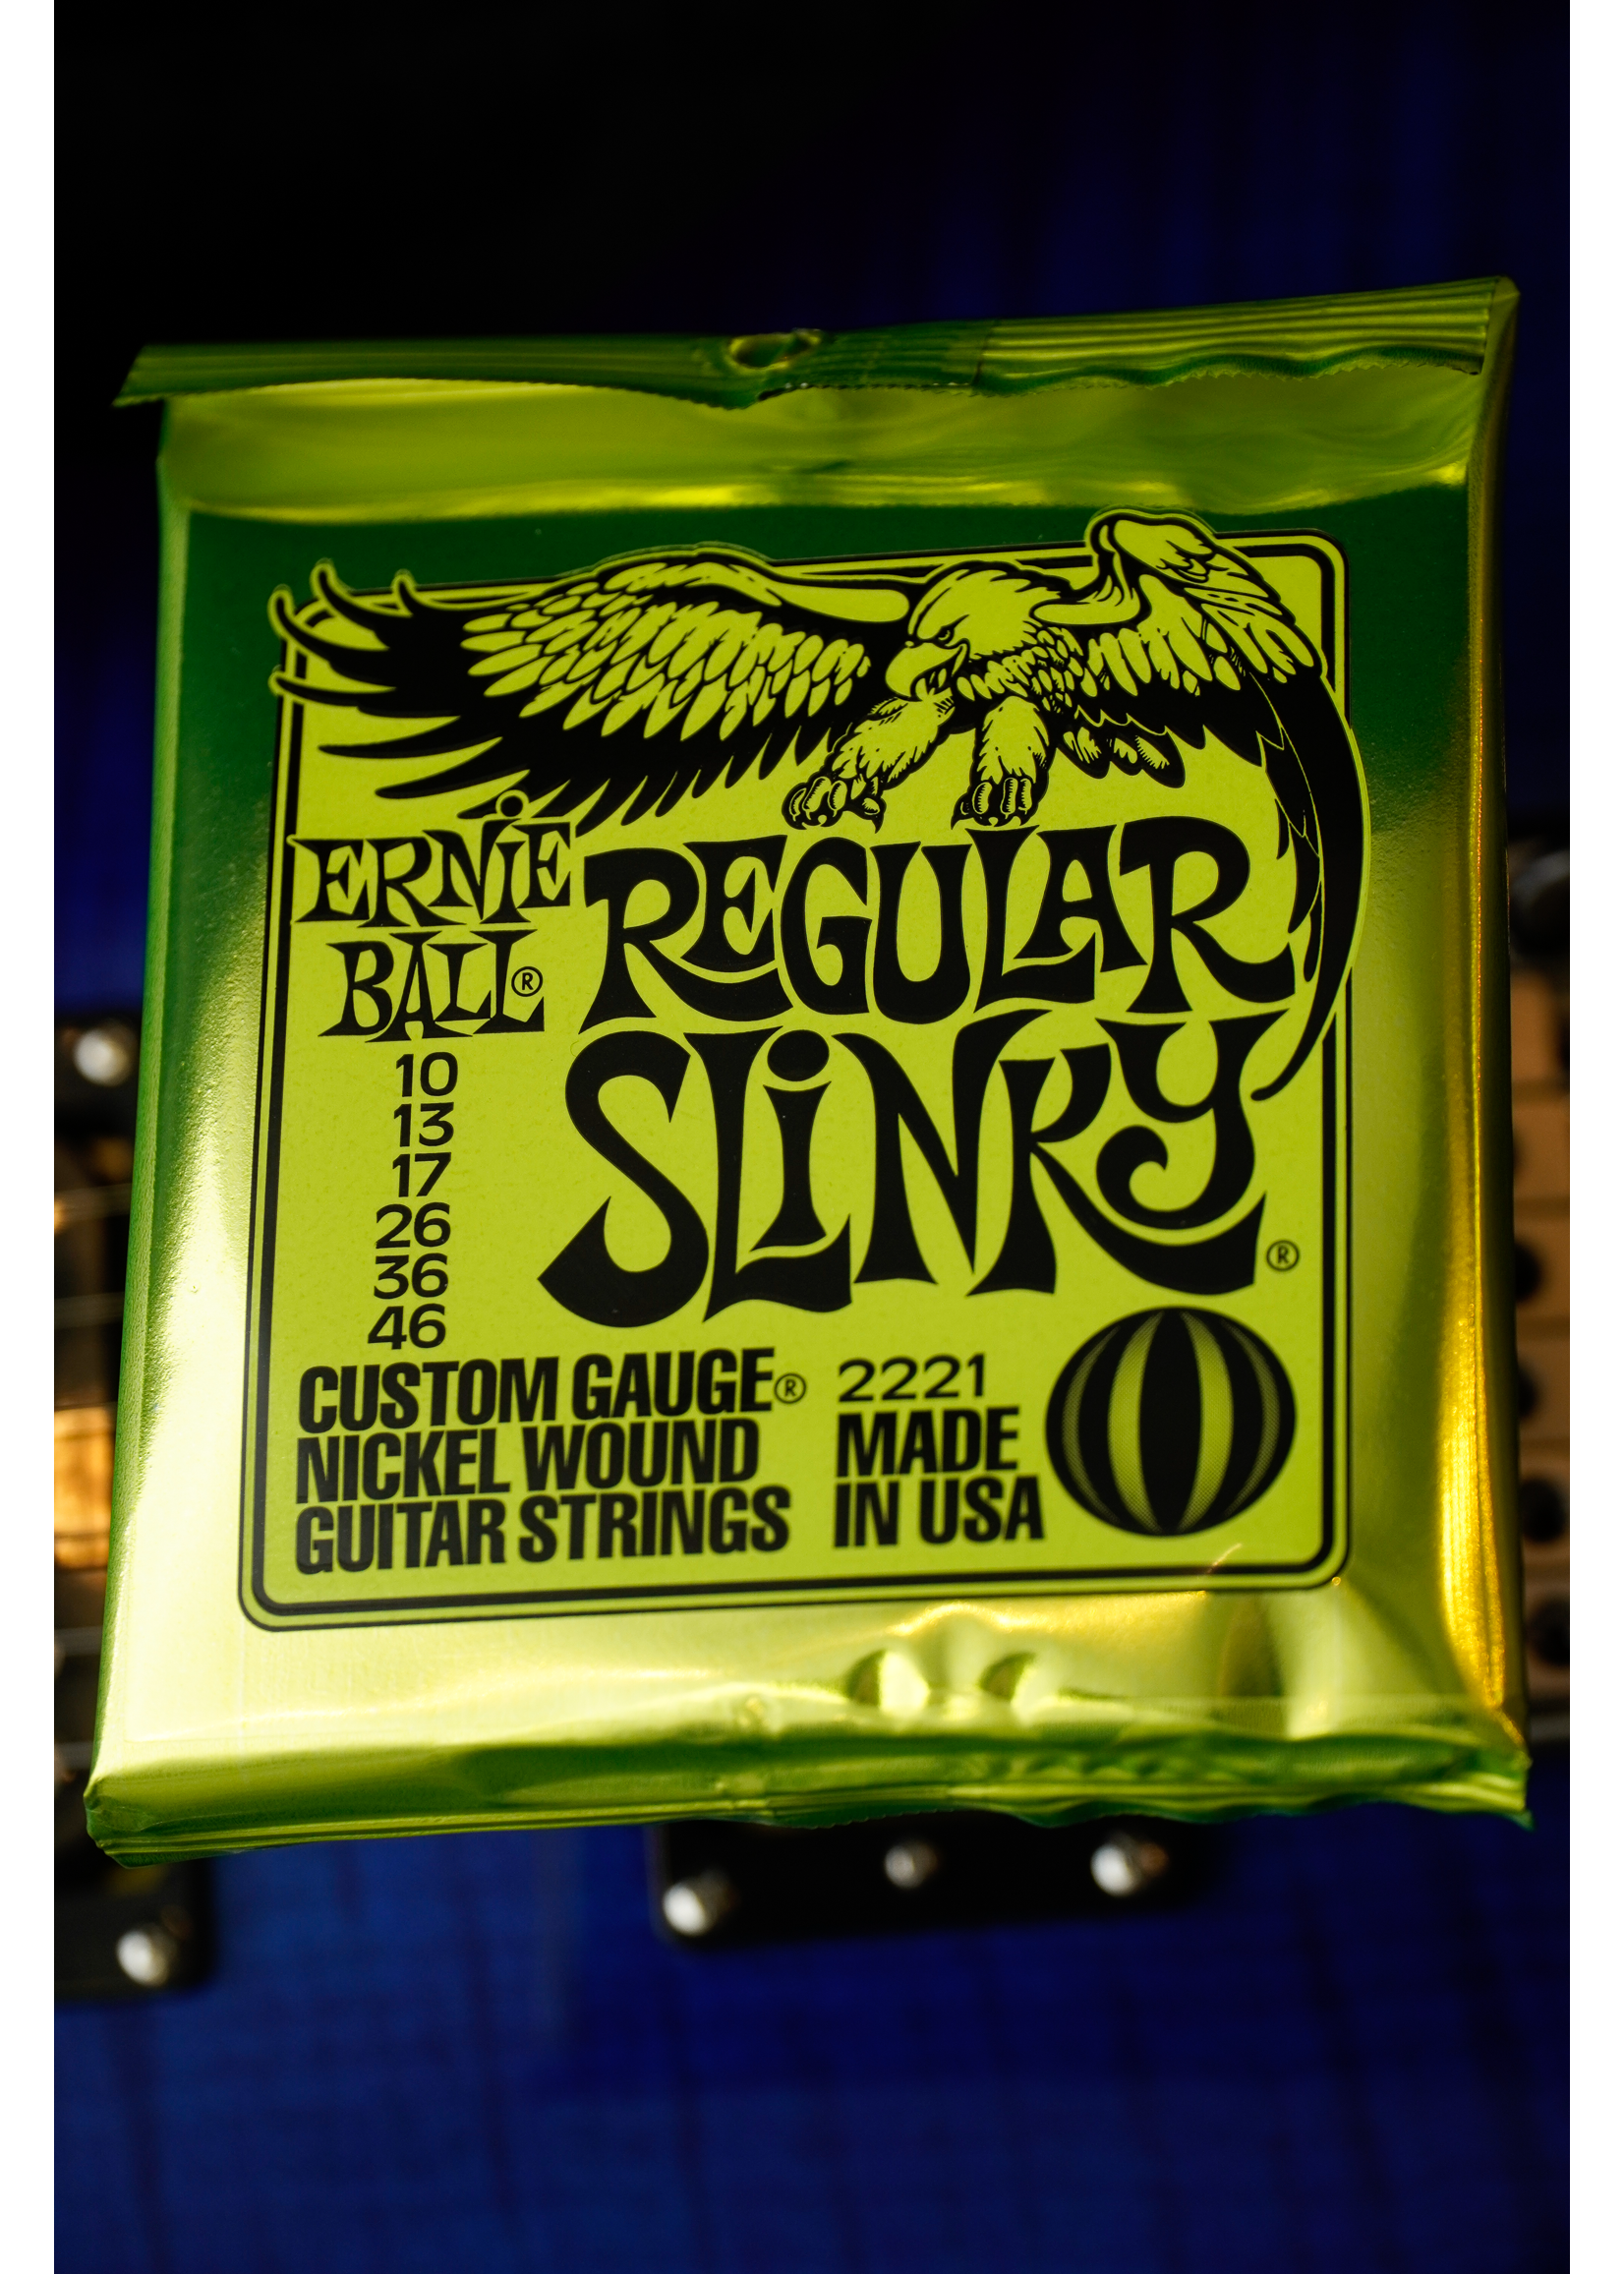 ernie ball Ernie Ball Regular Slinky Nickel Wound Electric Guitar Strings - 10-46 Gauge